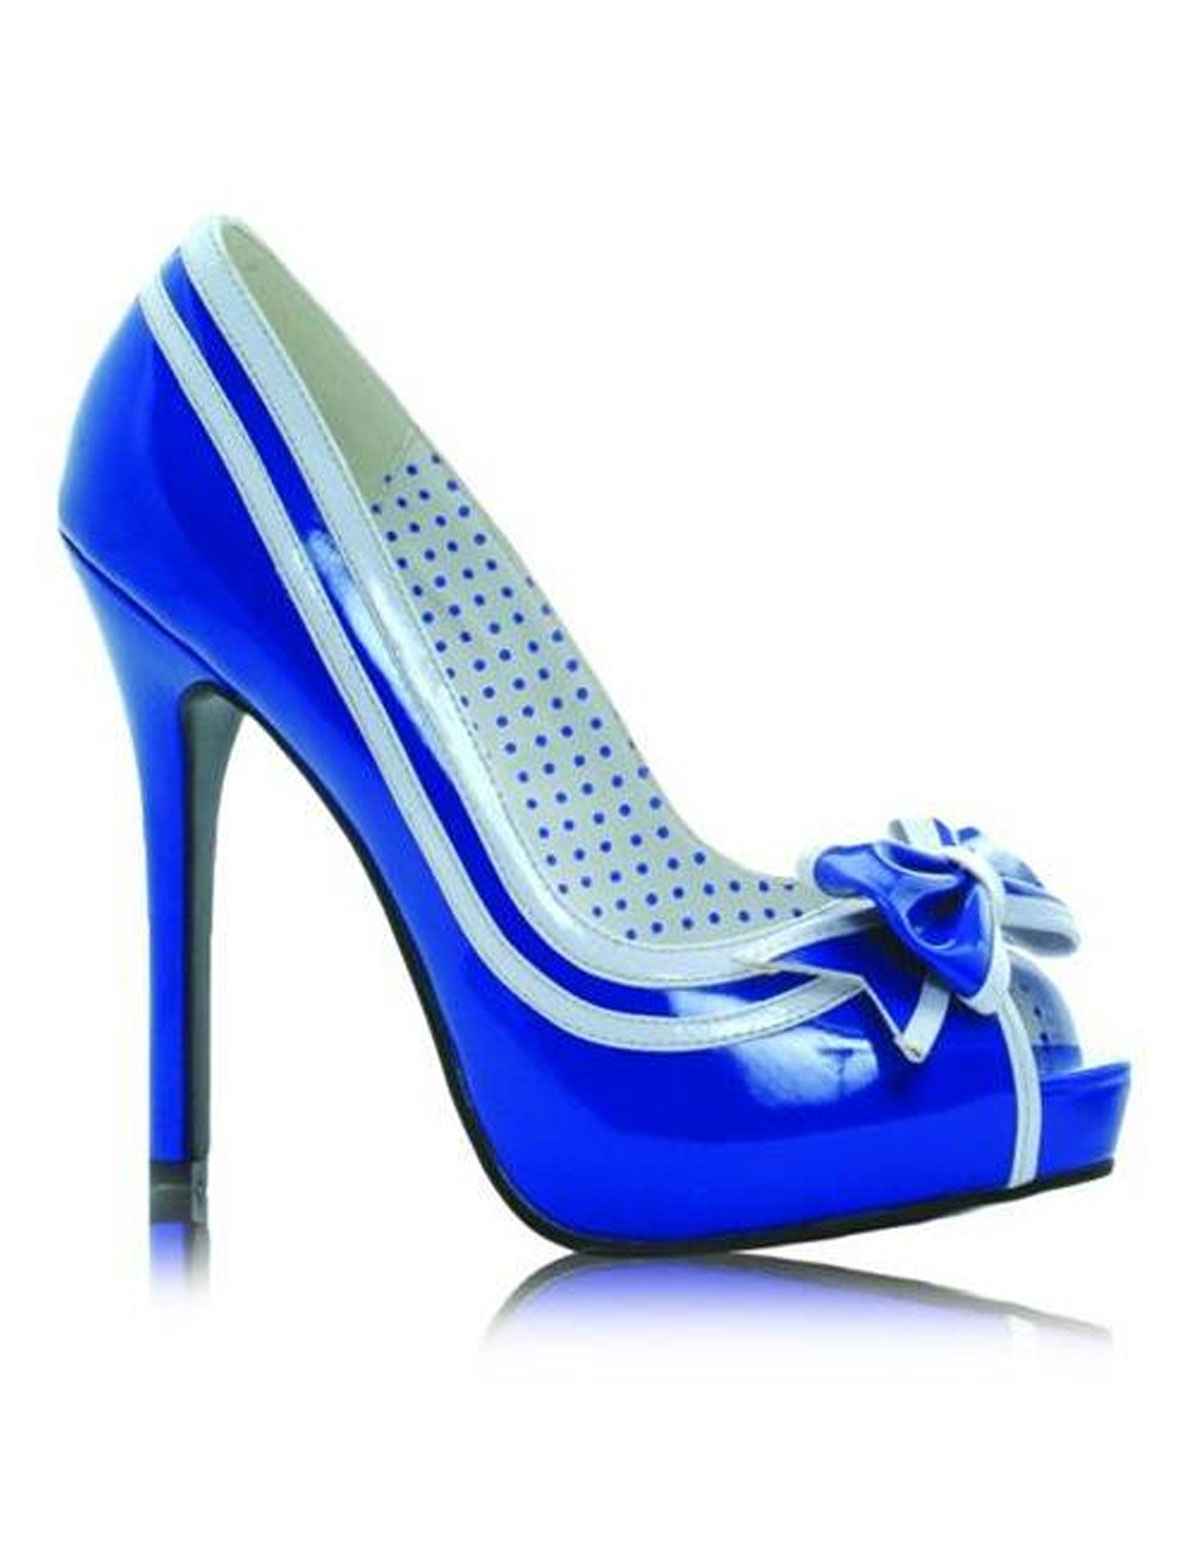 Siren Sailor Shoe